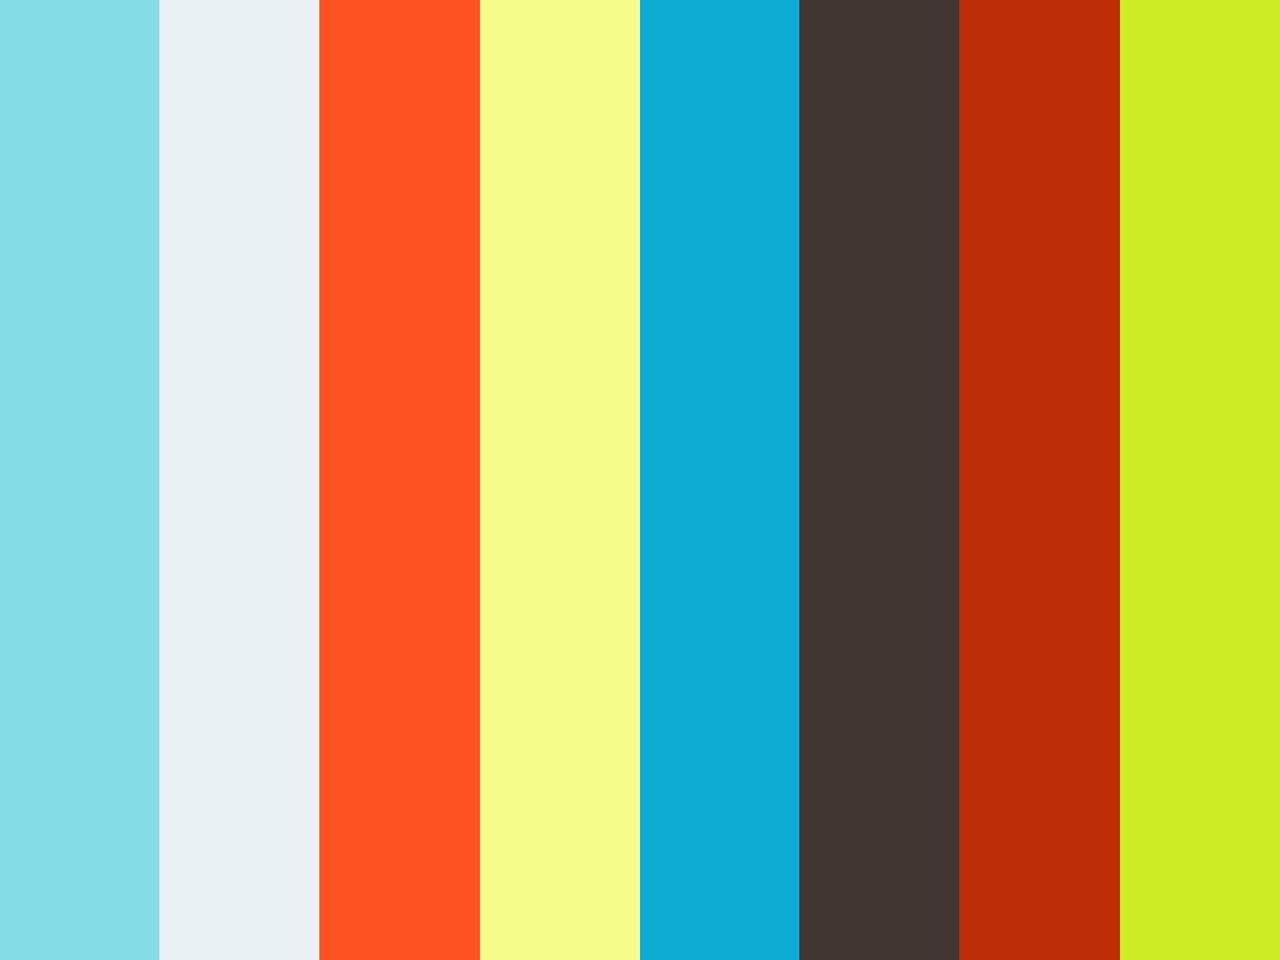 Webstock '13: Craig Mod - Subcompact Publishing